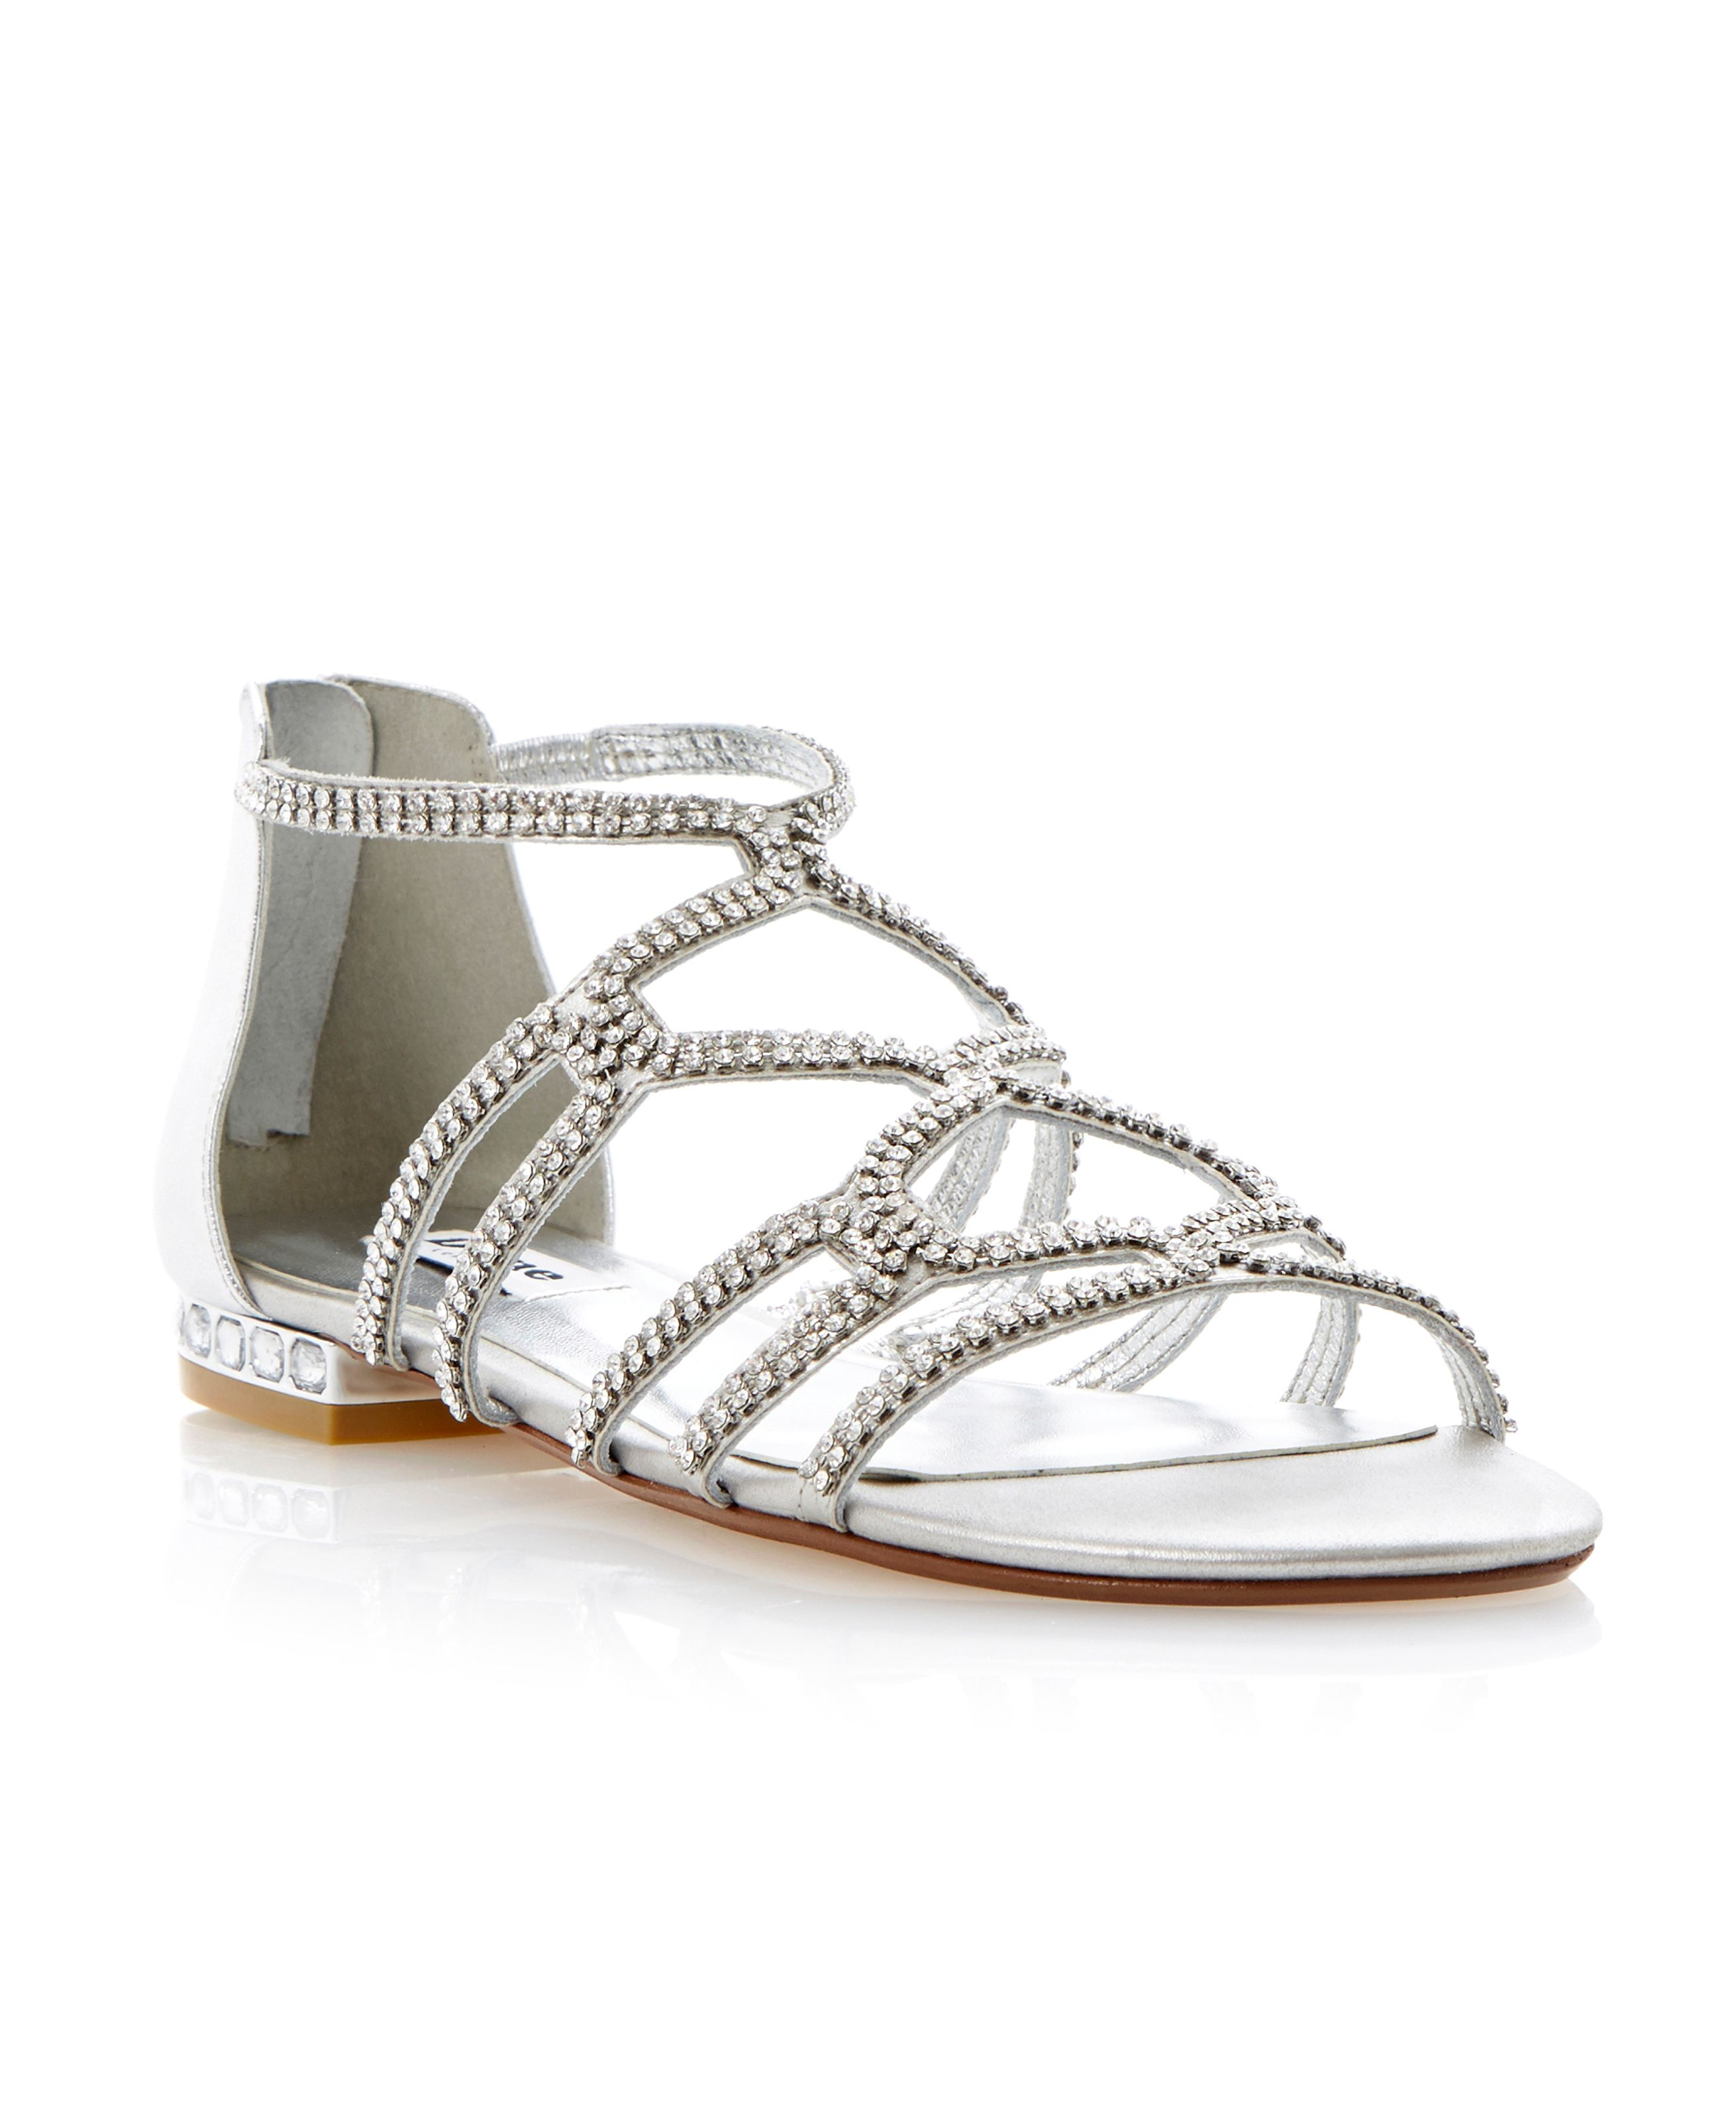 Dune Kym Caged Diamante Flat Sandals in Metallic | Lyst